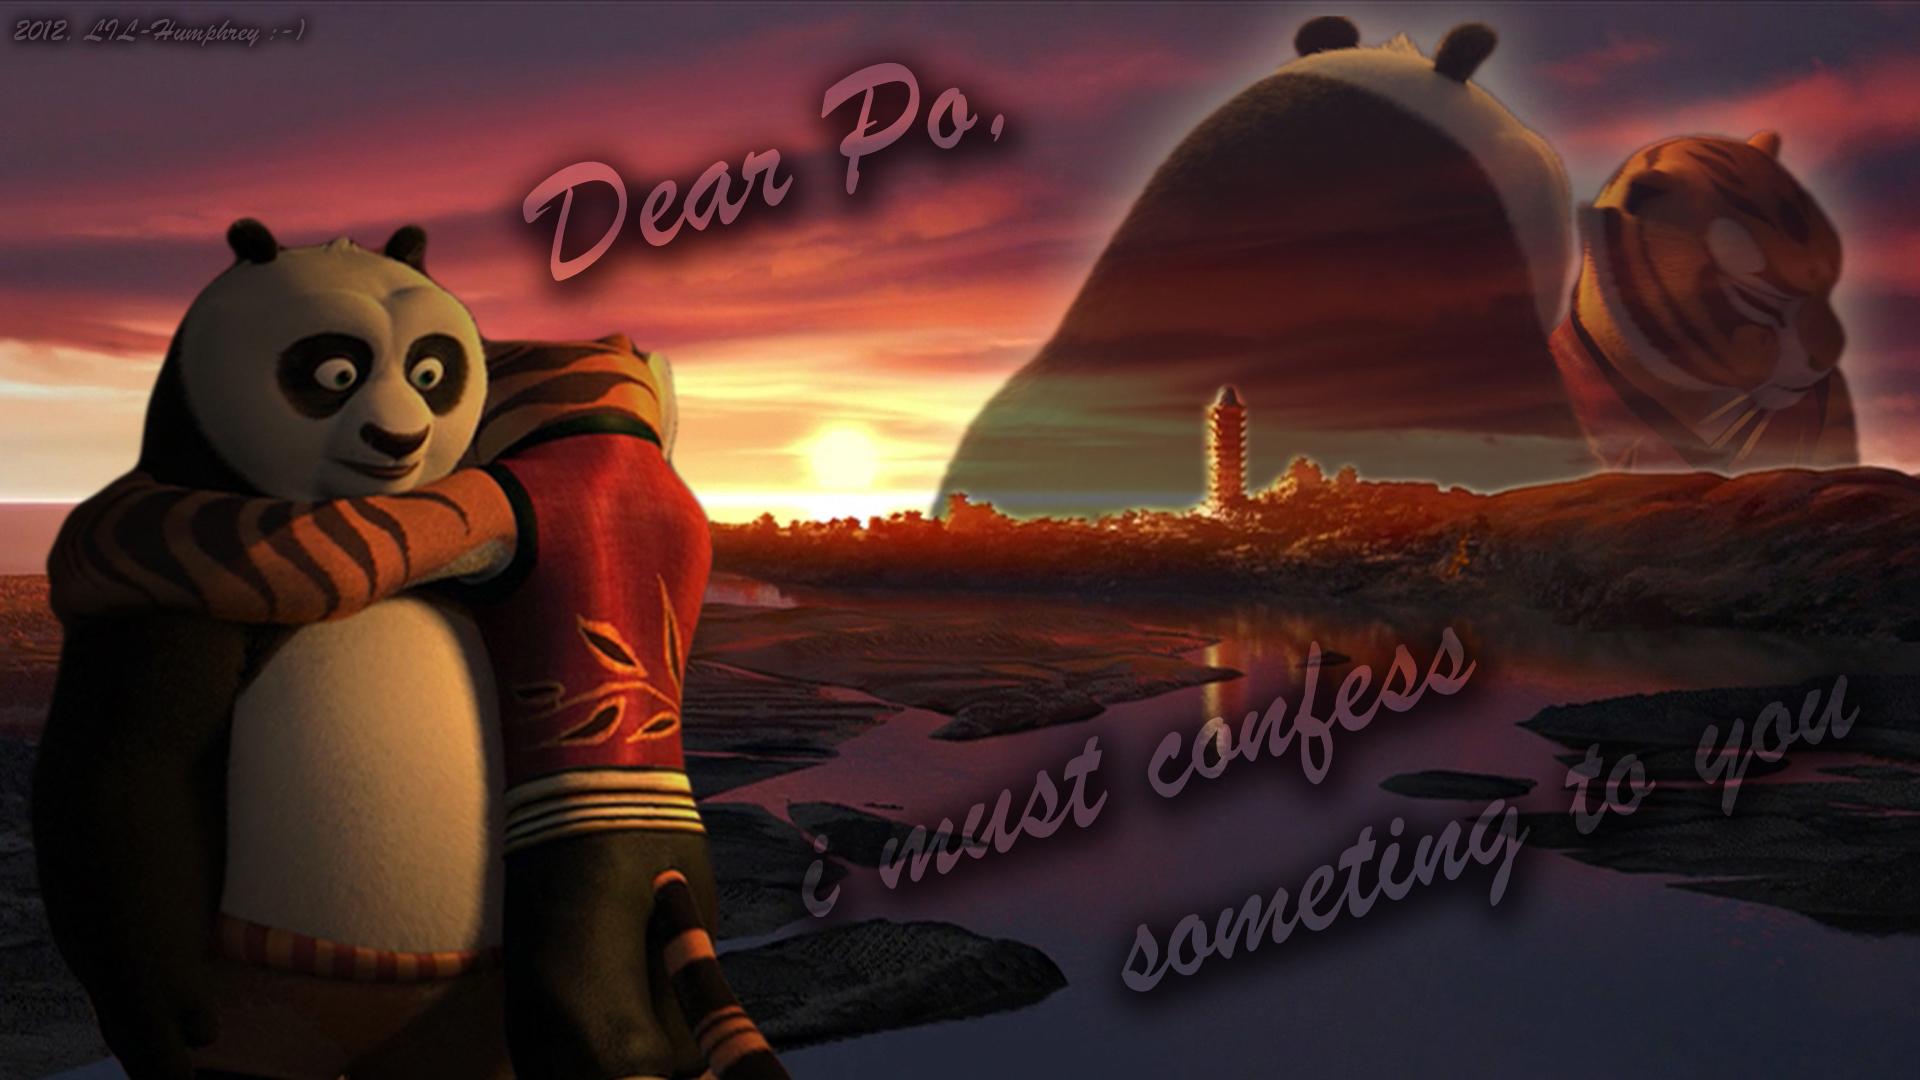 kung fu panda images tigress's confession hd wallpaper and